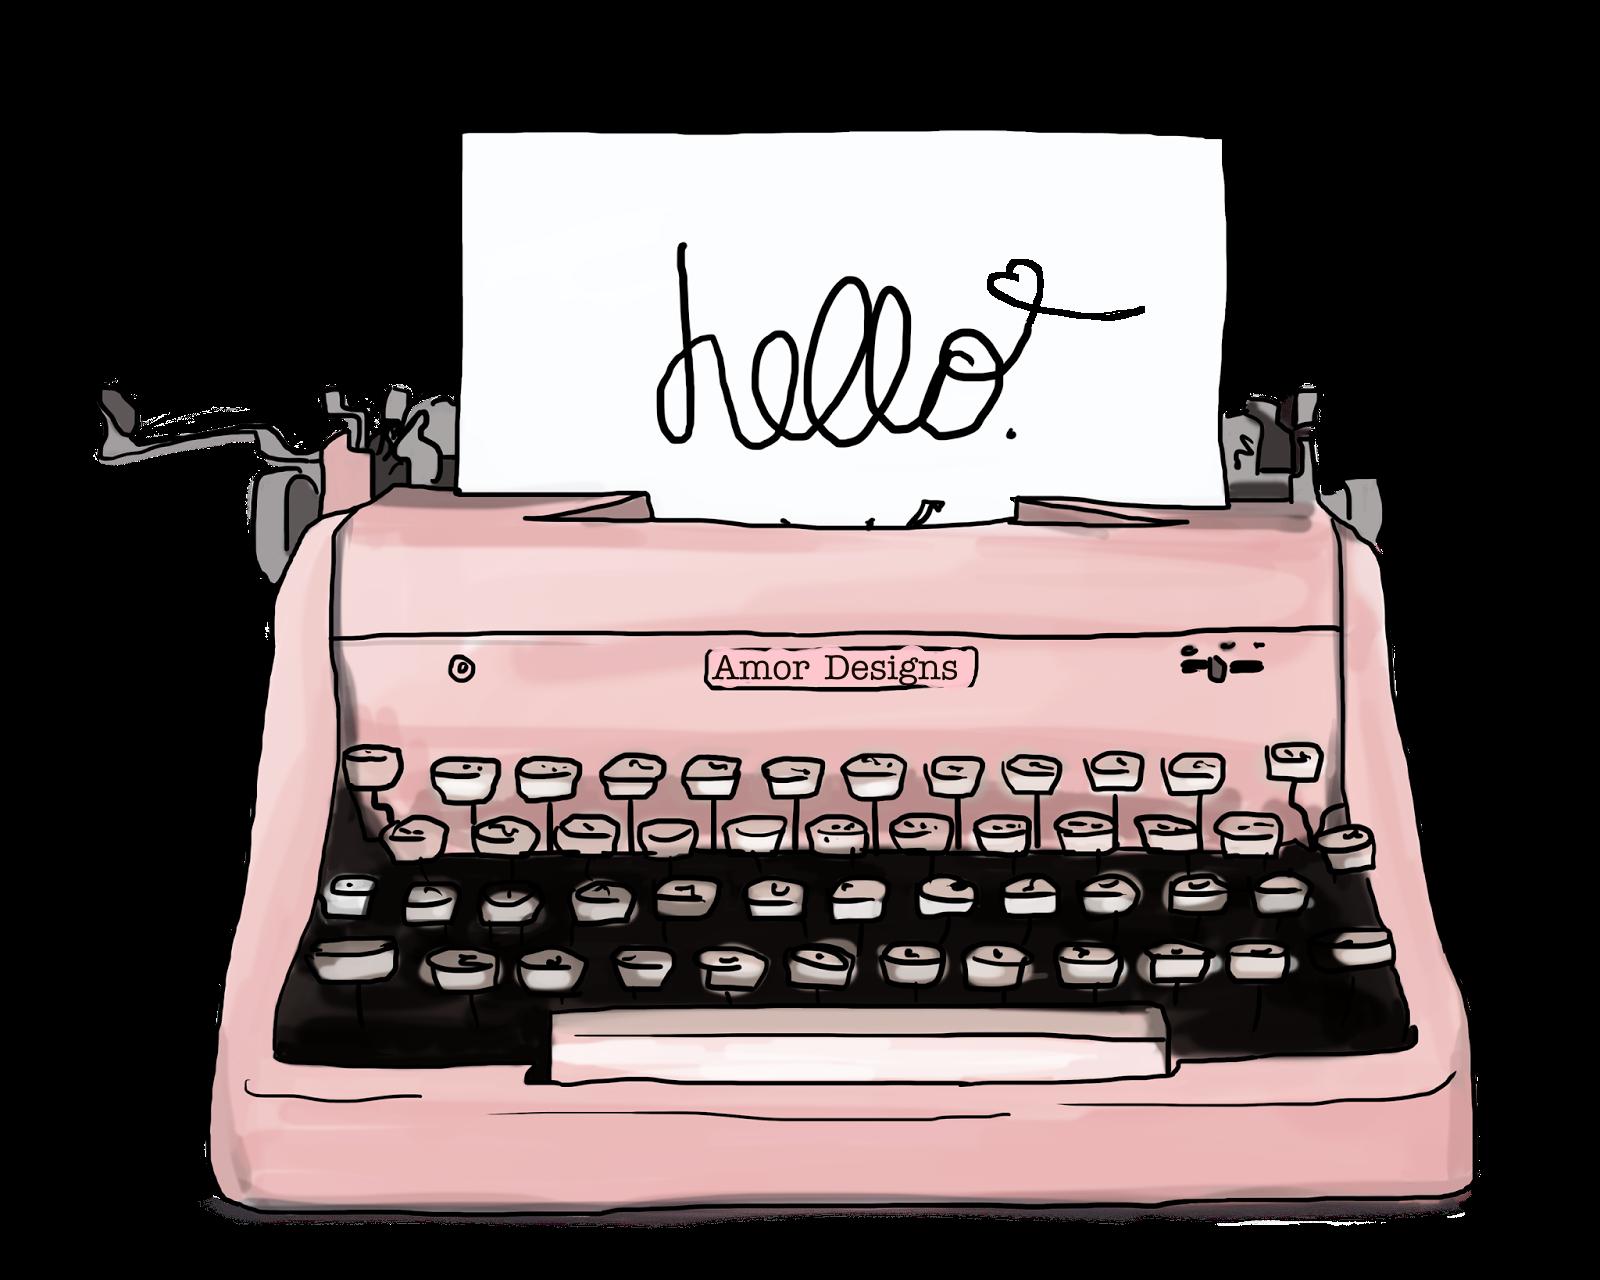 Amor Designs blog